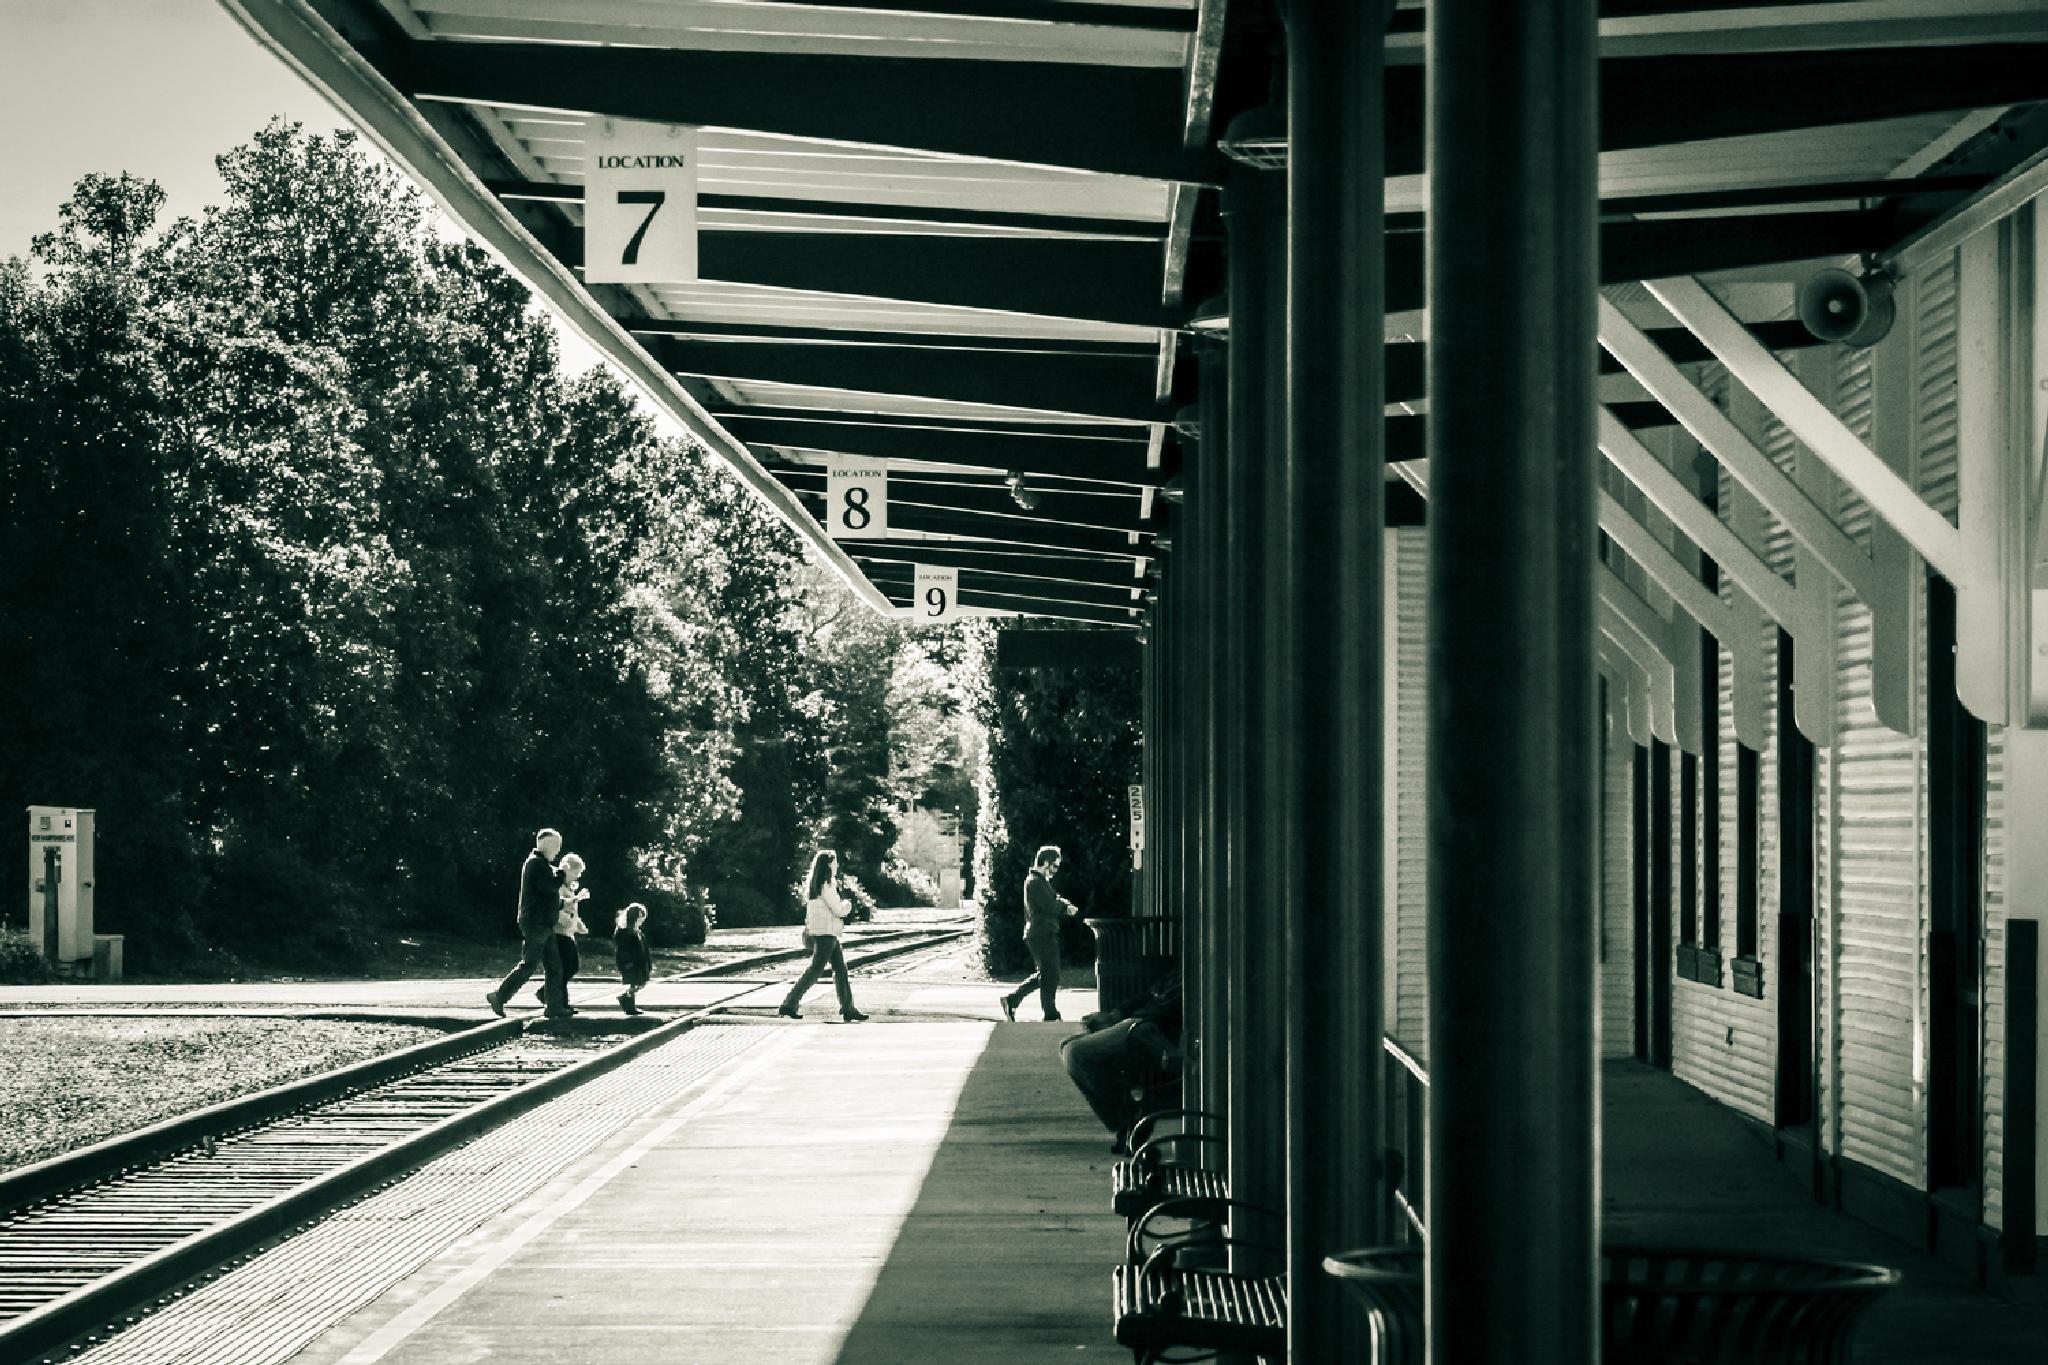 The Platform by NaturesVeiwsPhotography